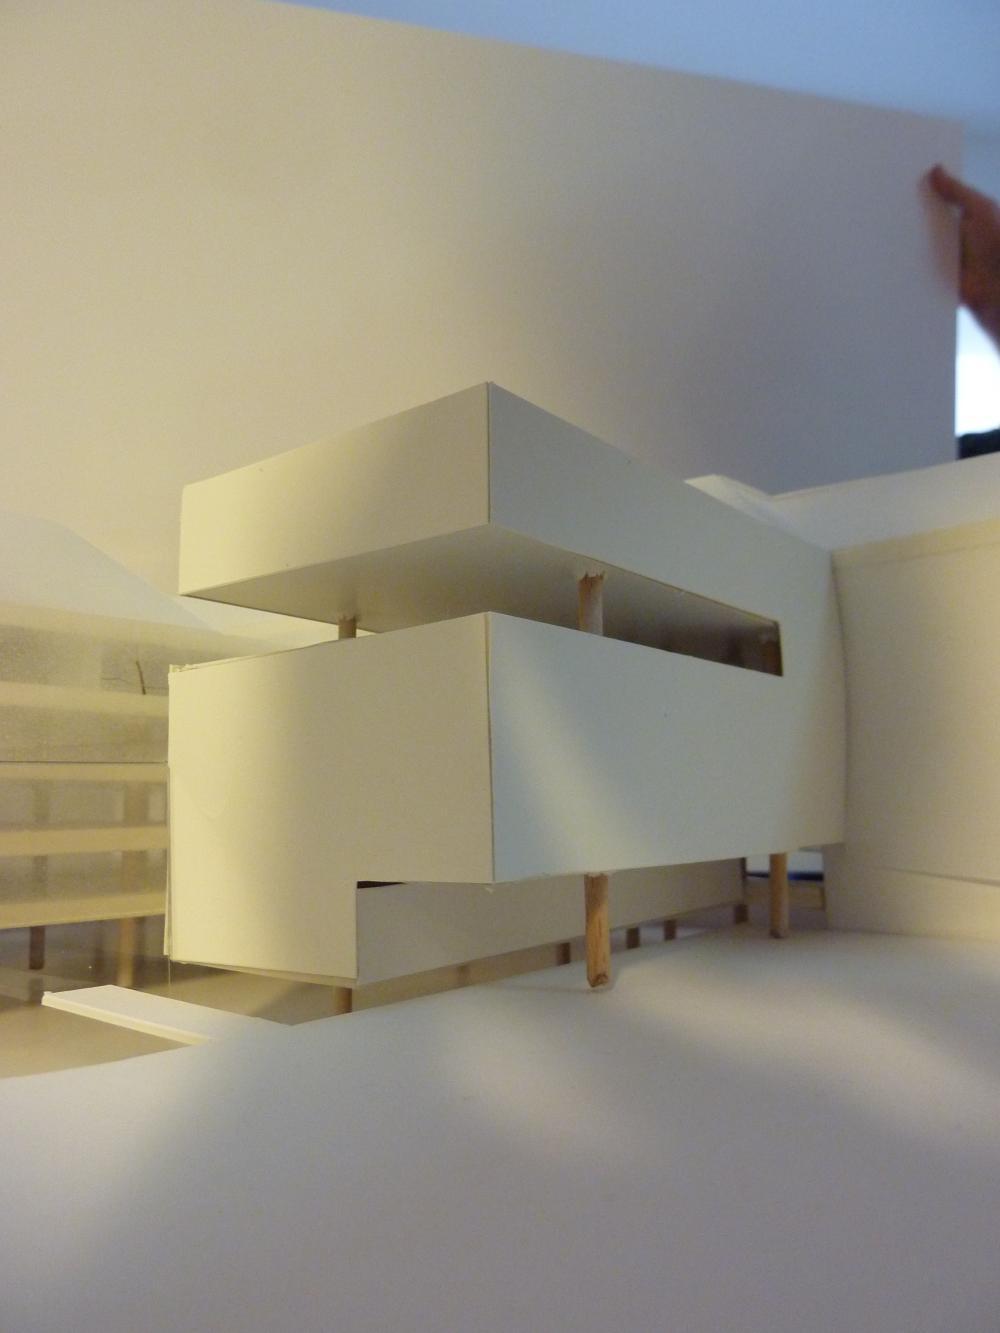 https://nbc-arhitect.ro/wp-content/uploads/2020/10/NBC-Arhitect-_-contests-_-The-National-Library-Liubliana-_-Liubliana_18.jpg